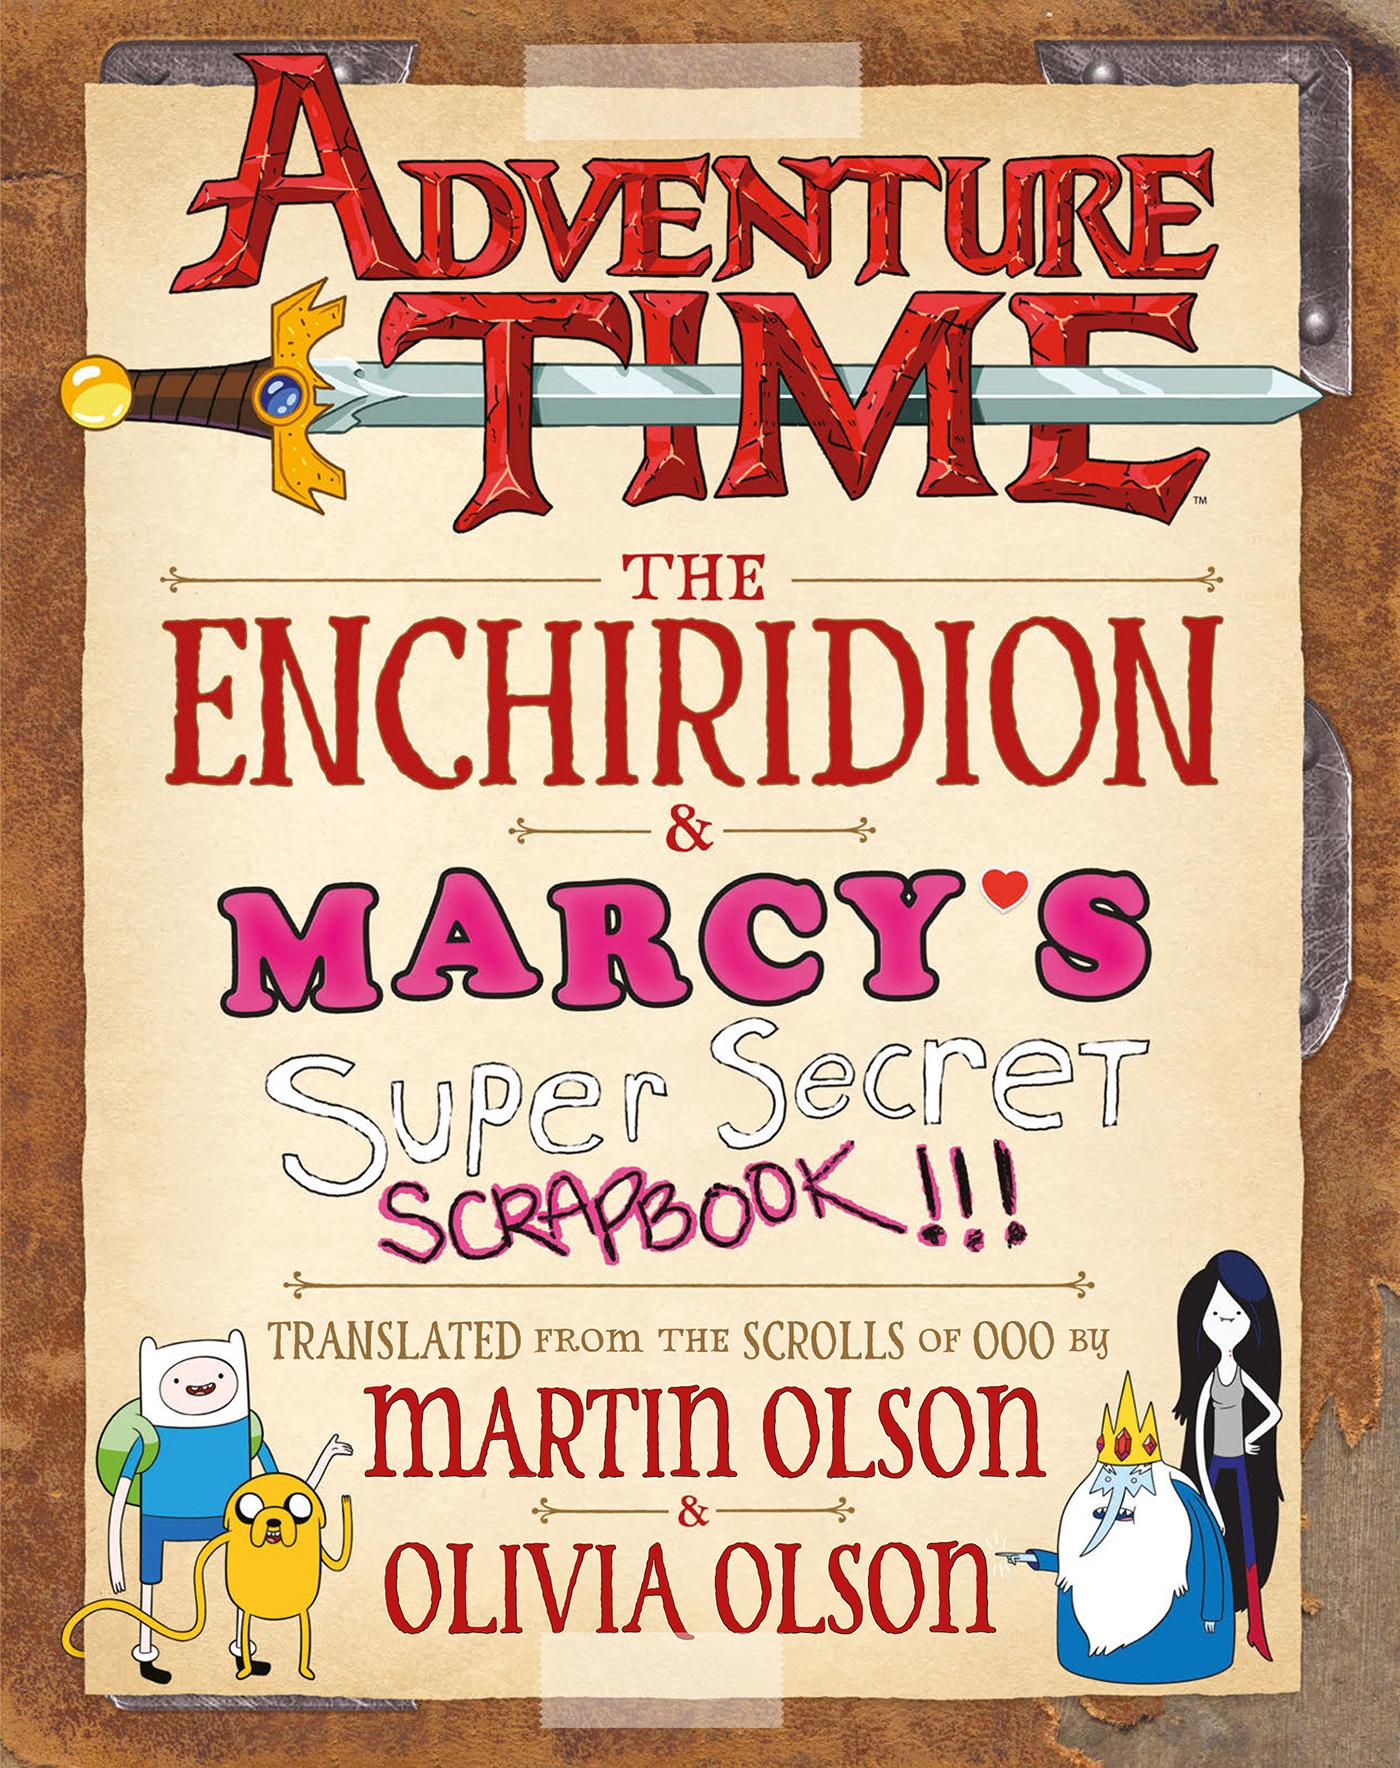 Adventure Time: The Enchiridion  Marcy's Super Secret Scrapbook!!!